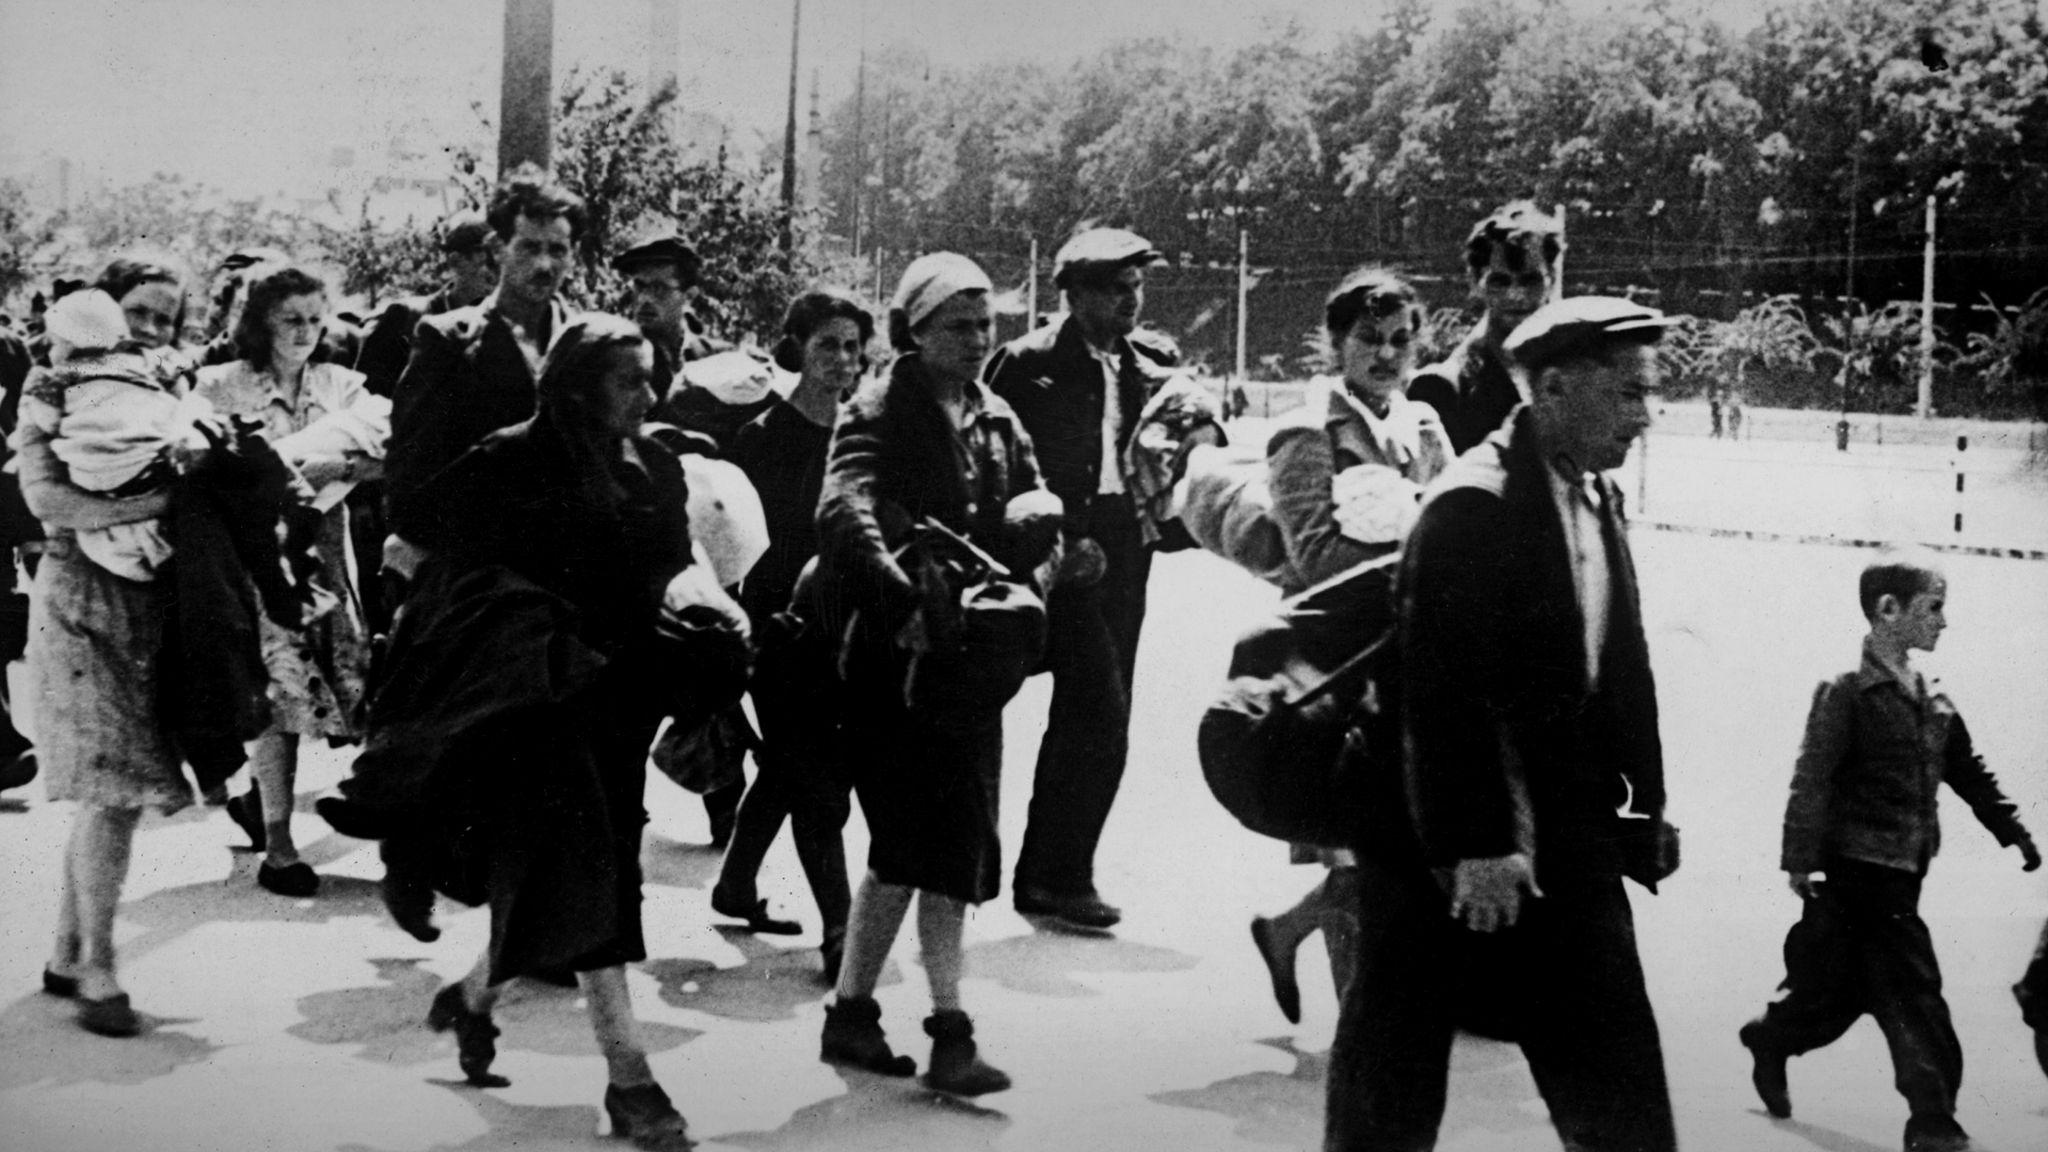 Jewish families head towards US-controlled zones in Austria - near Bratislava, 1946